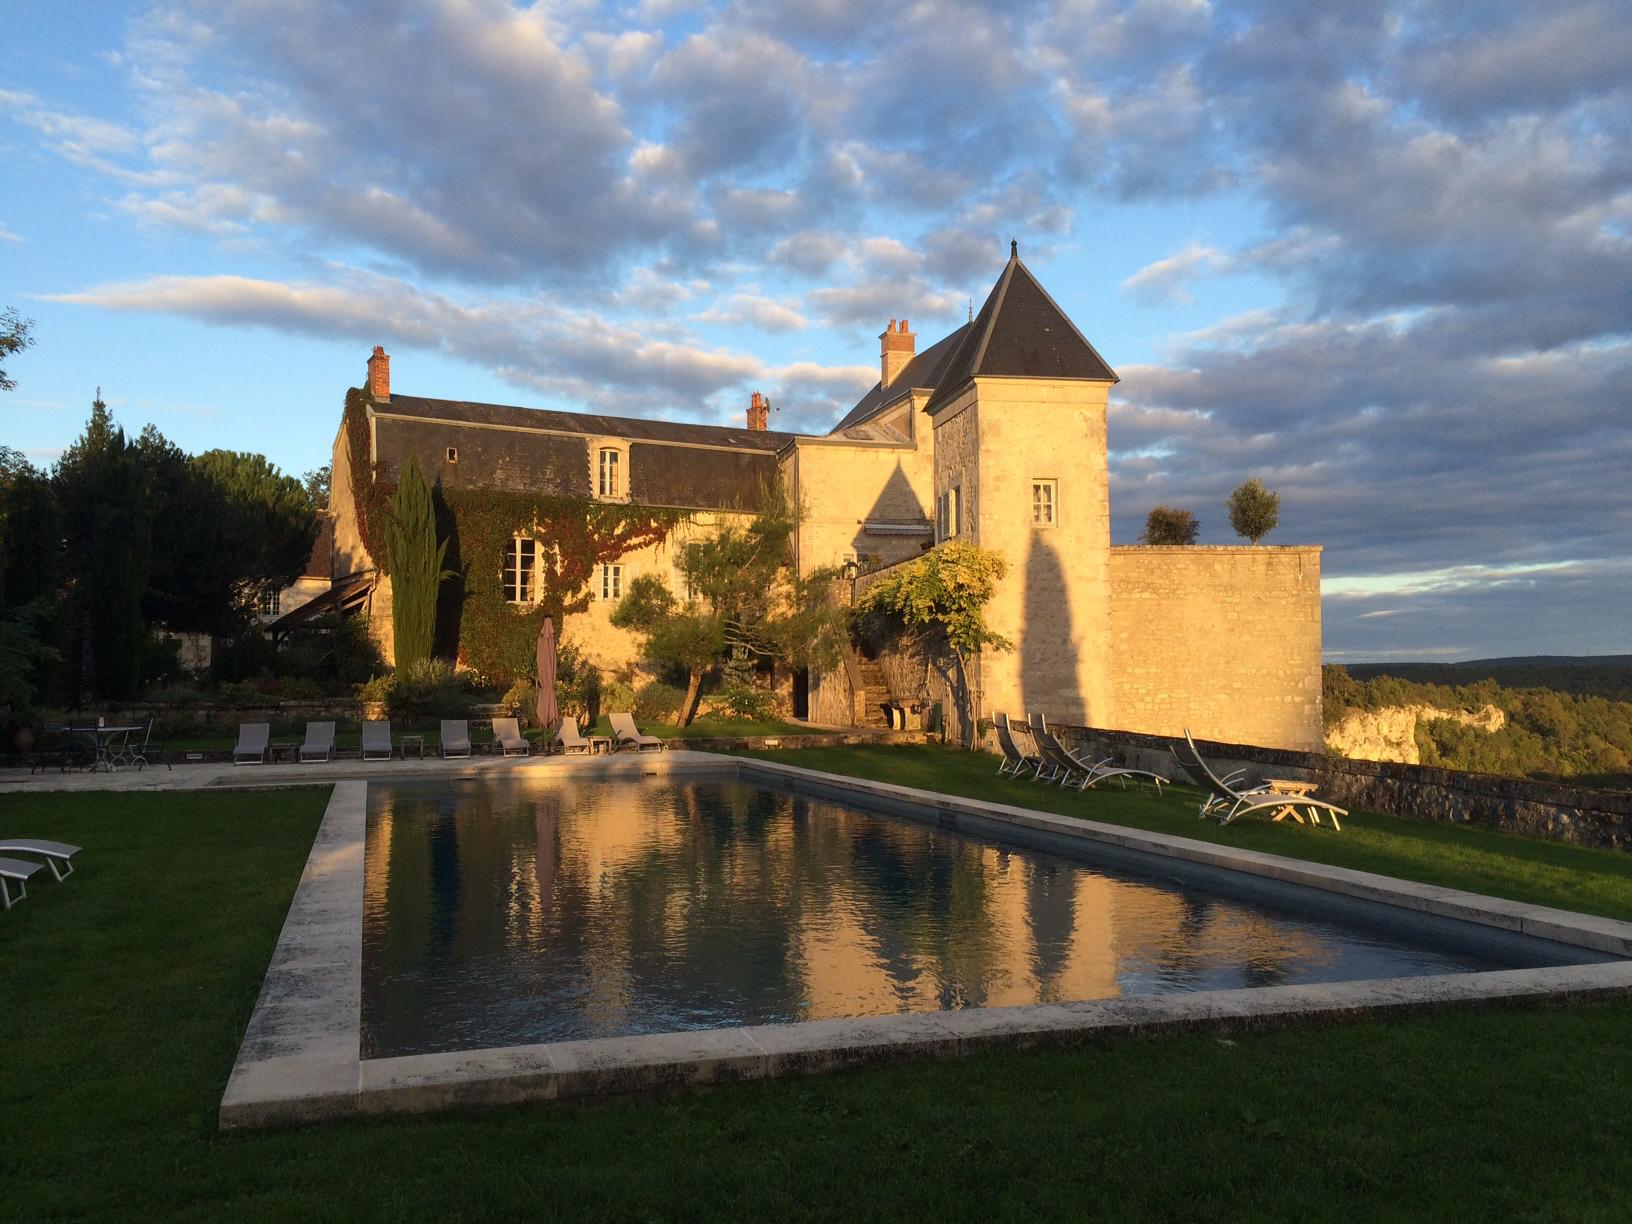 Chateau_Pool Horizontal_Sunset.jpg